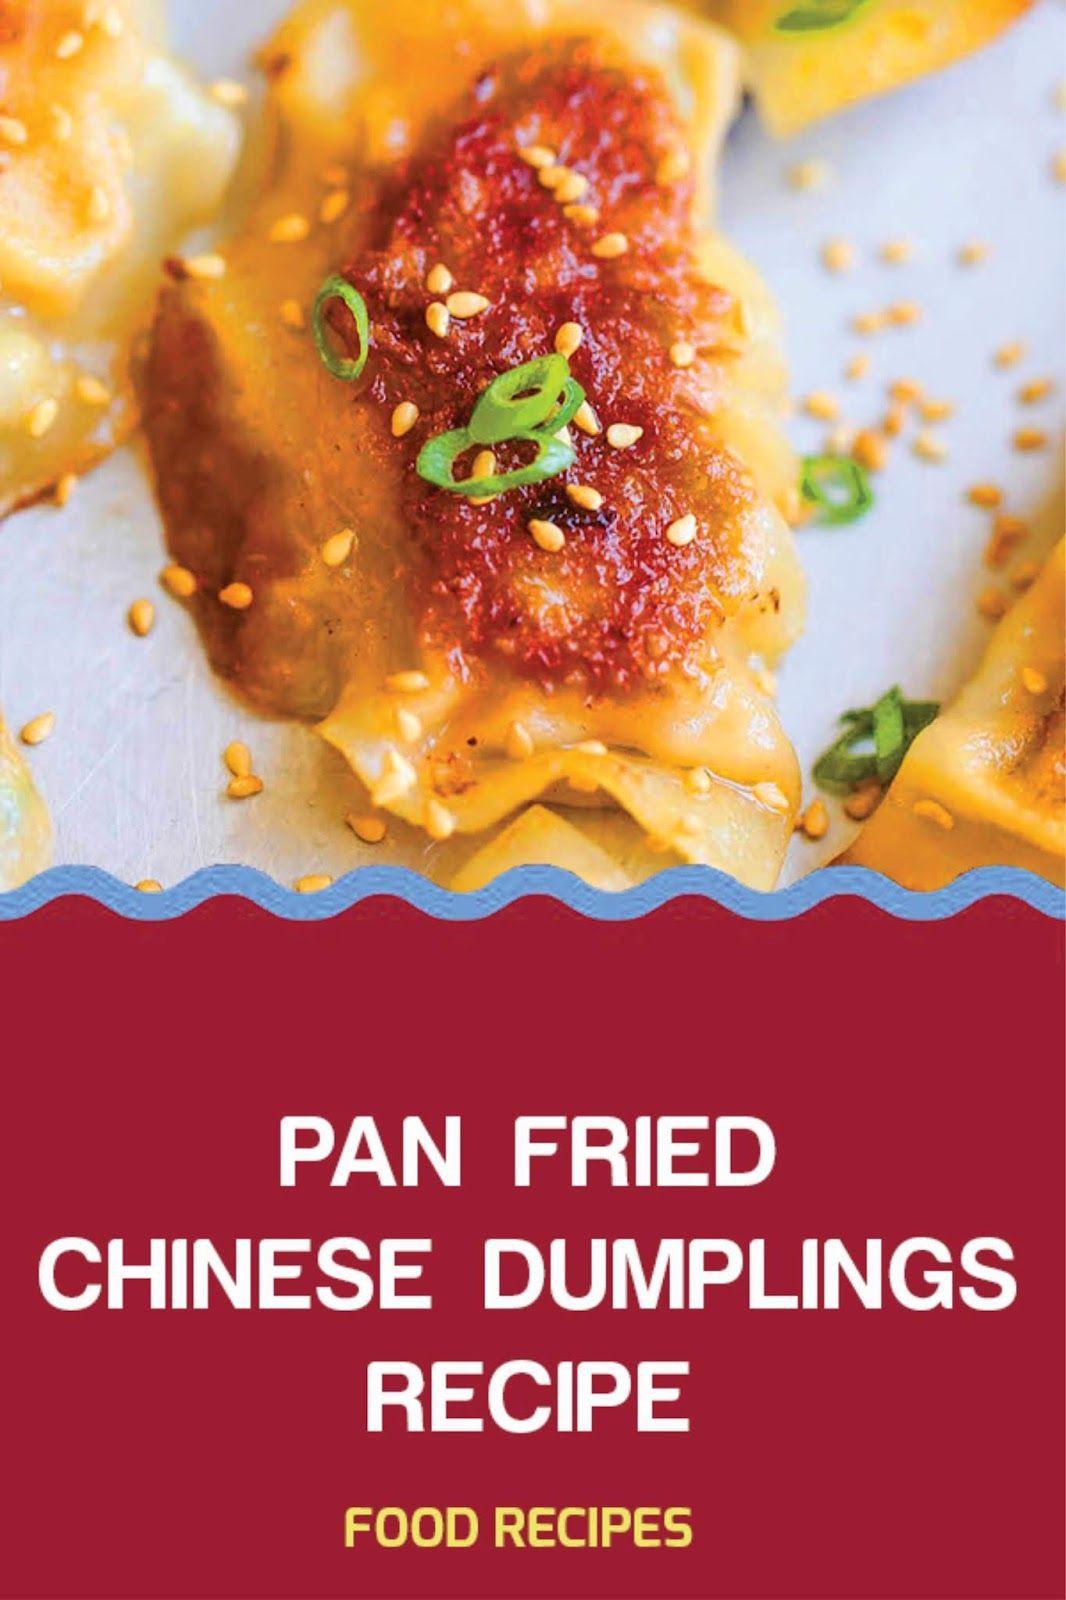 Vegetarian Chinese Dumplings Recipe  PAN FRIED CHINESE DUMPLINGS RECIPE in 2020 With images